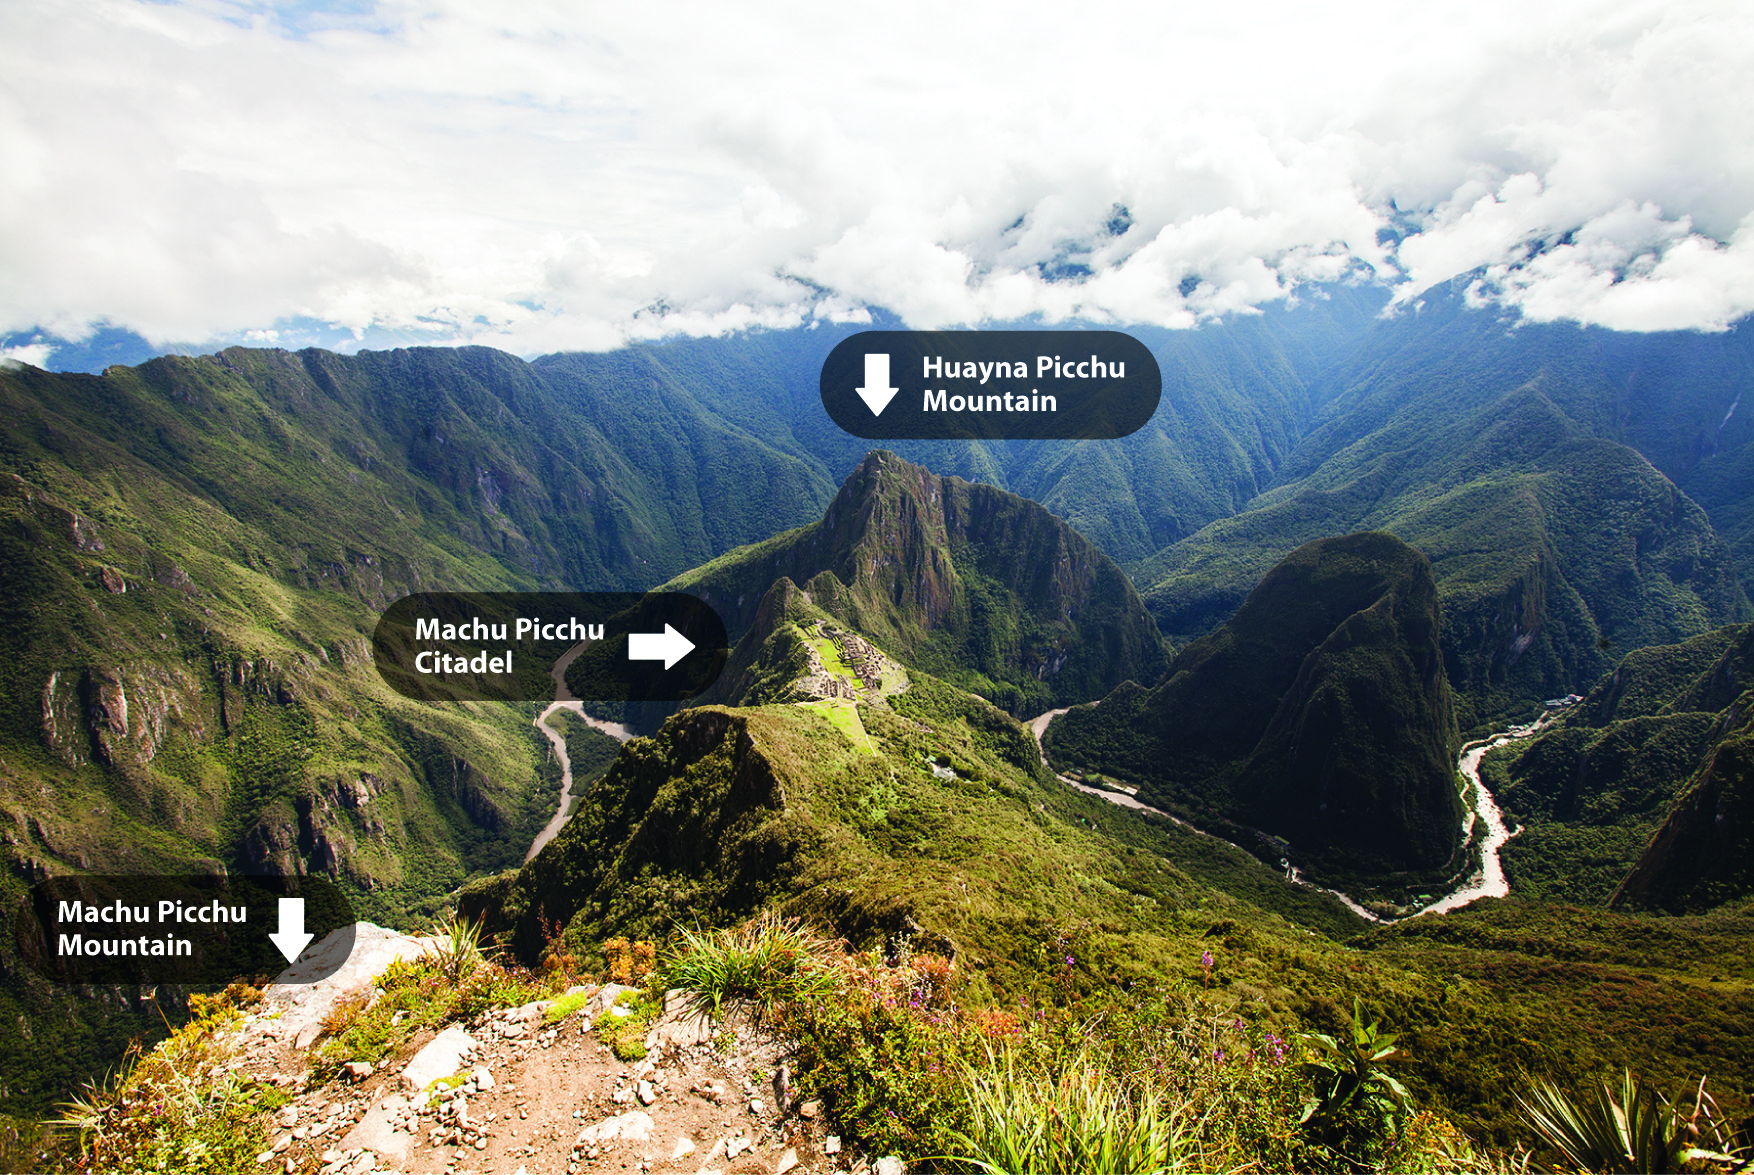 Trek Machu Picchu Mountain or Huayna Picchu? - Explorandes